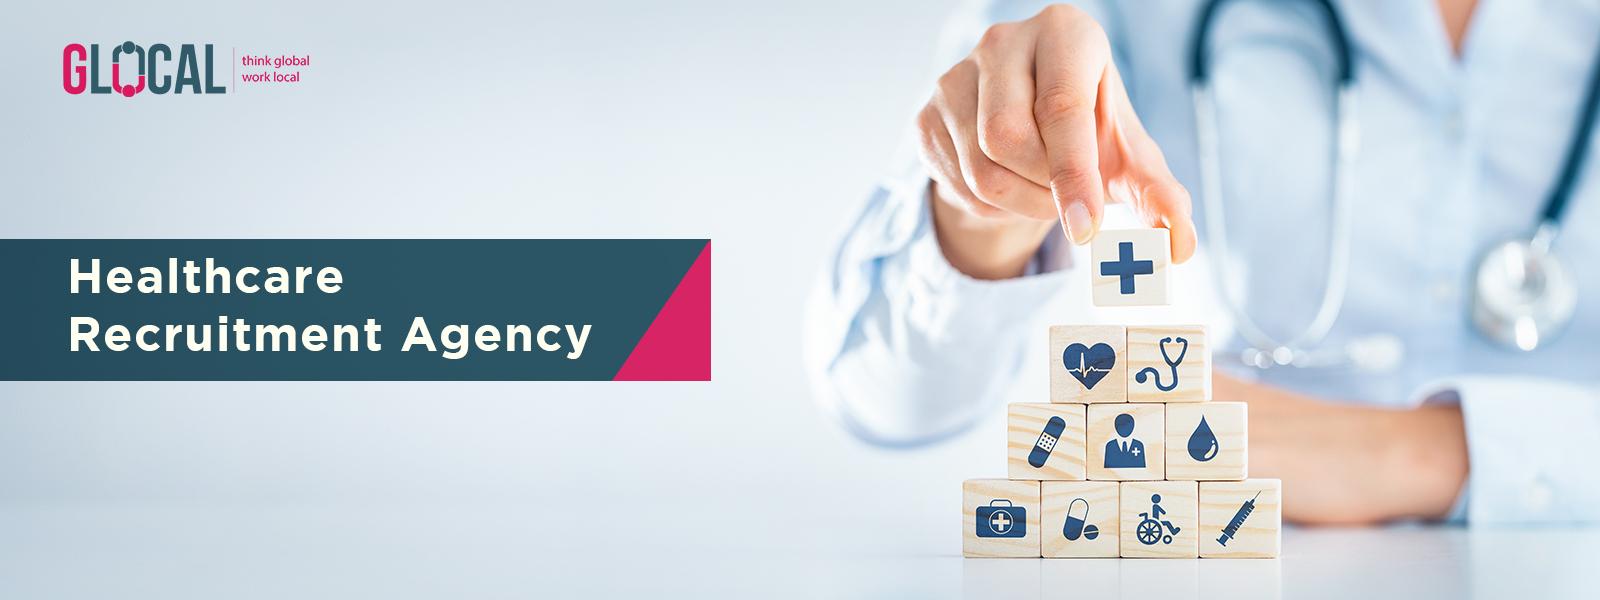 Healthcare Recruitment Agency